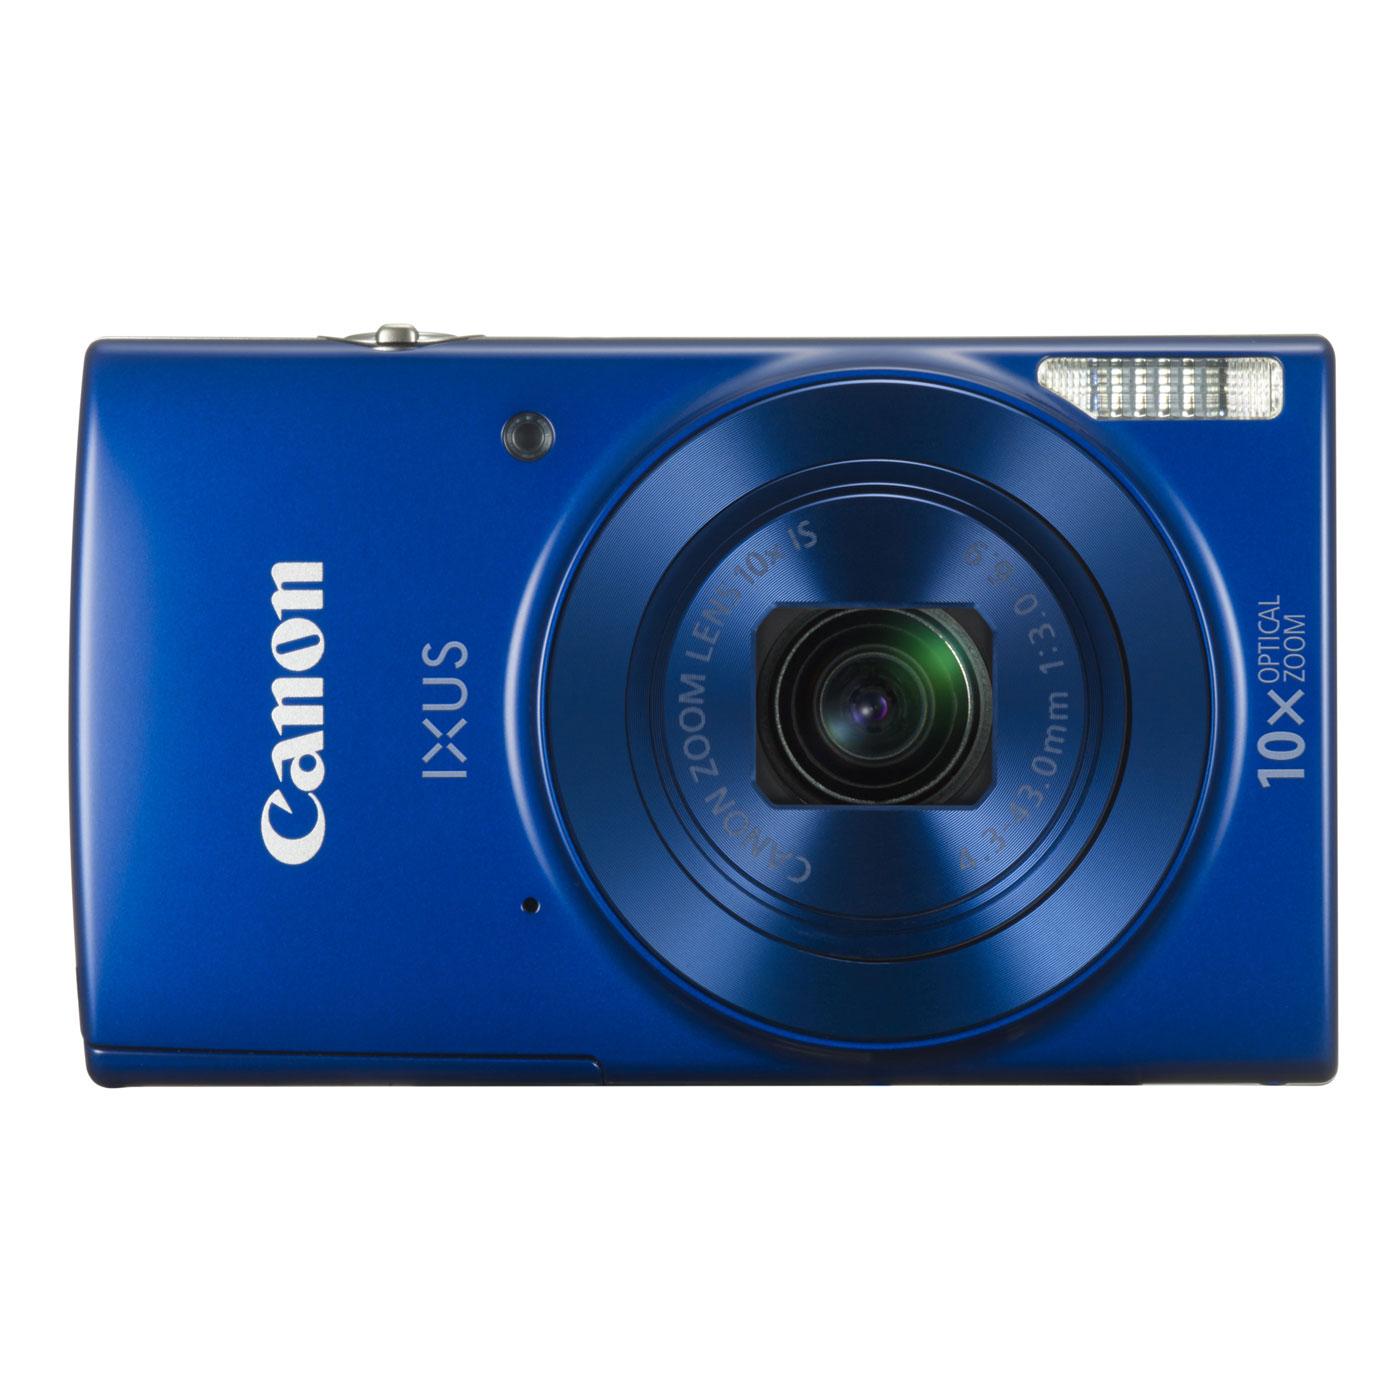 Canon ixus 180 bleu appareil photo num rique canon sur for Appareil photo ecran 180